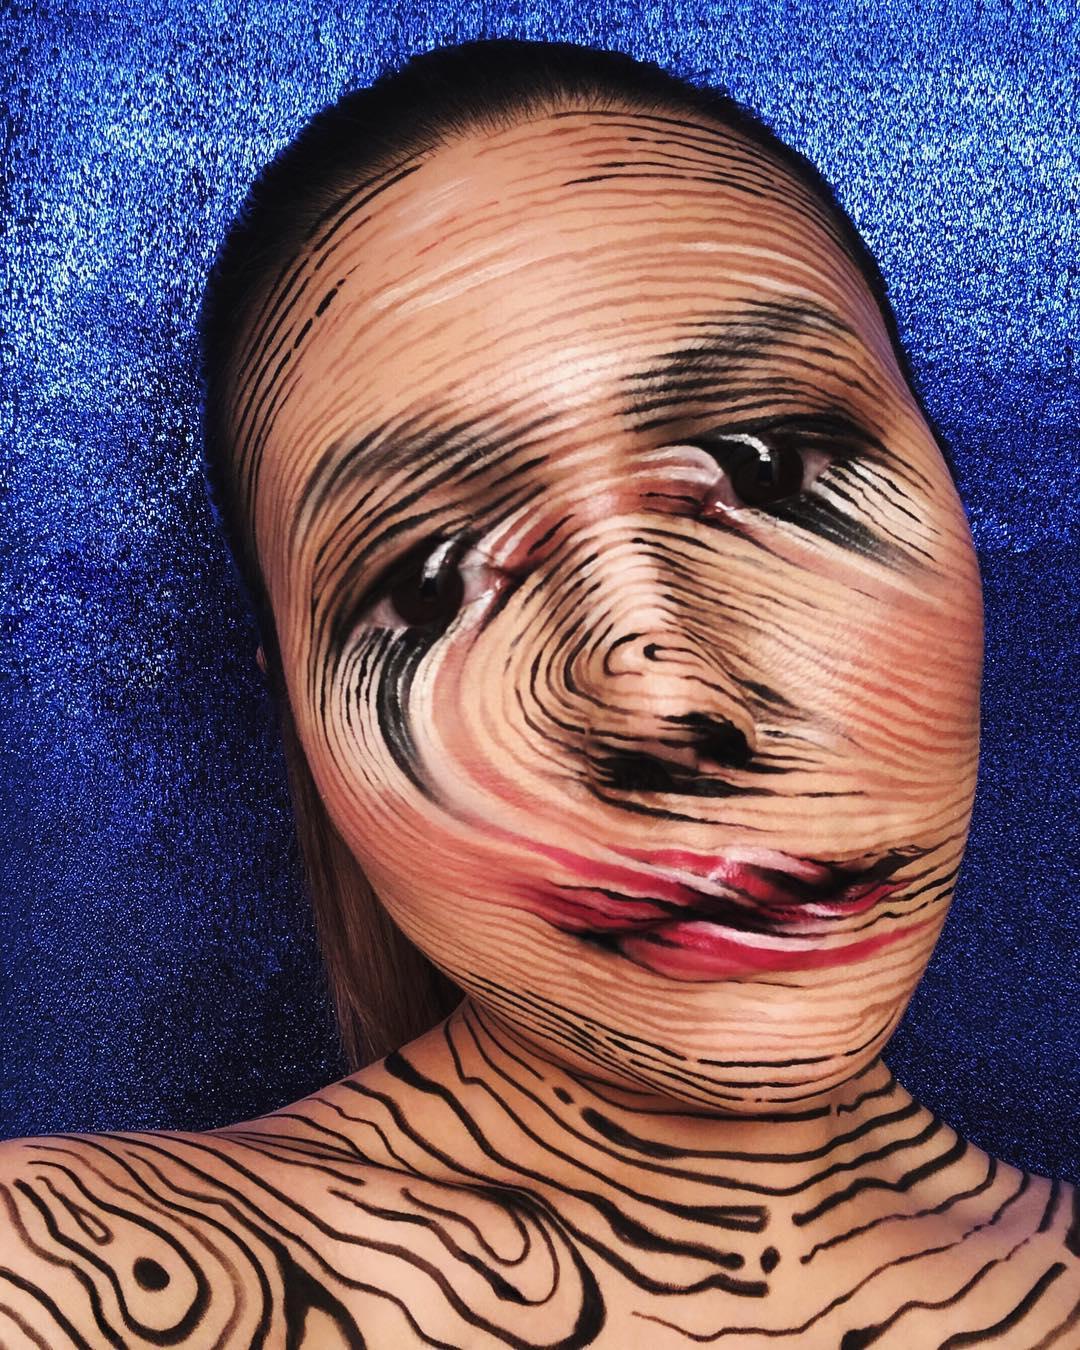 Mimi choi maquillaje ilusion optica (19)